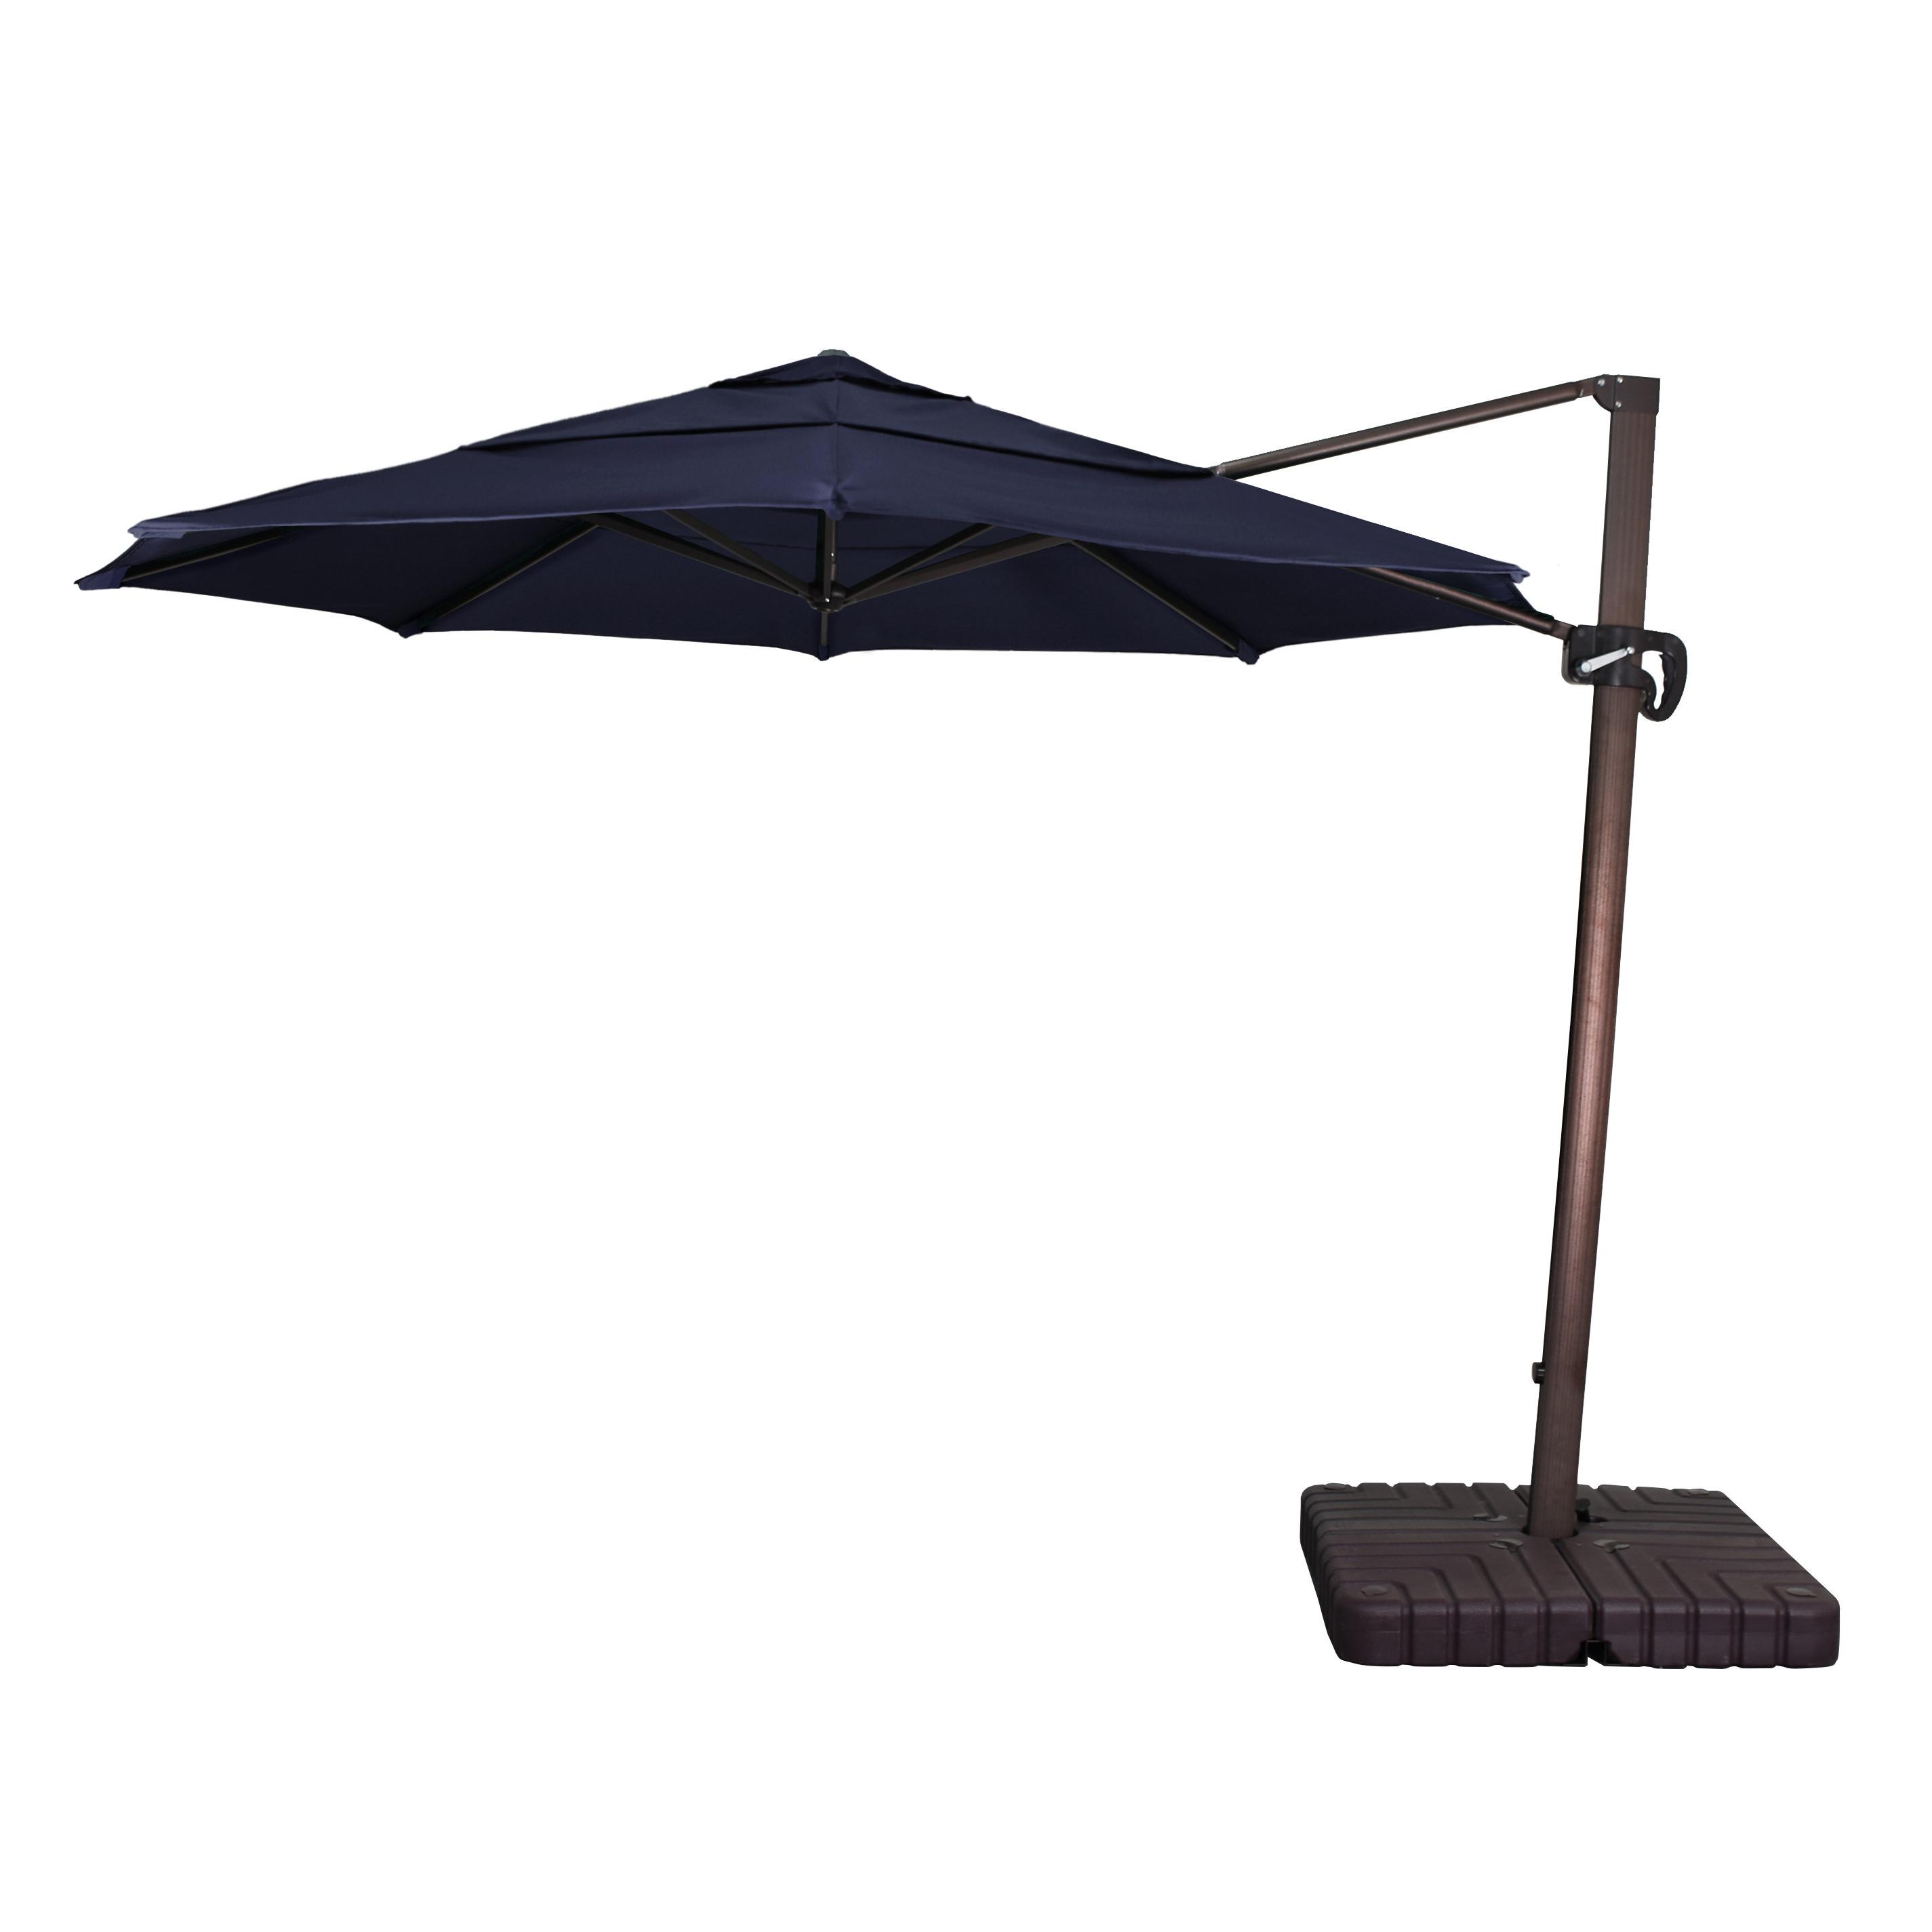 2019 Carlisle Square Cantilever Sunbrella Umbrellas Throughout Carlisle 11' Cantilever Sunbrella Umbrella (Gallery 4 of 20)